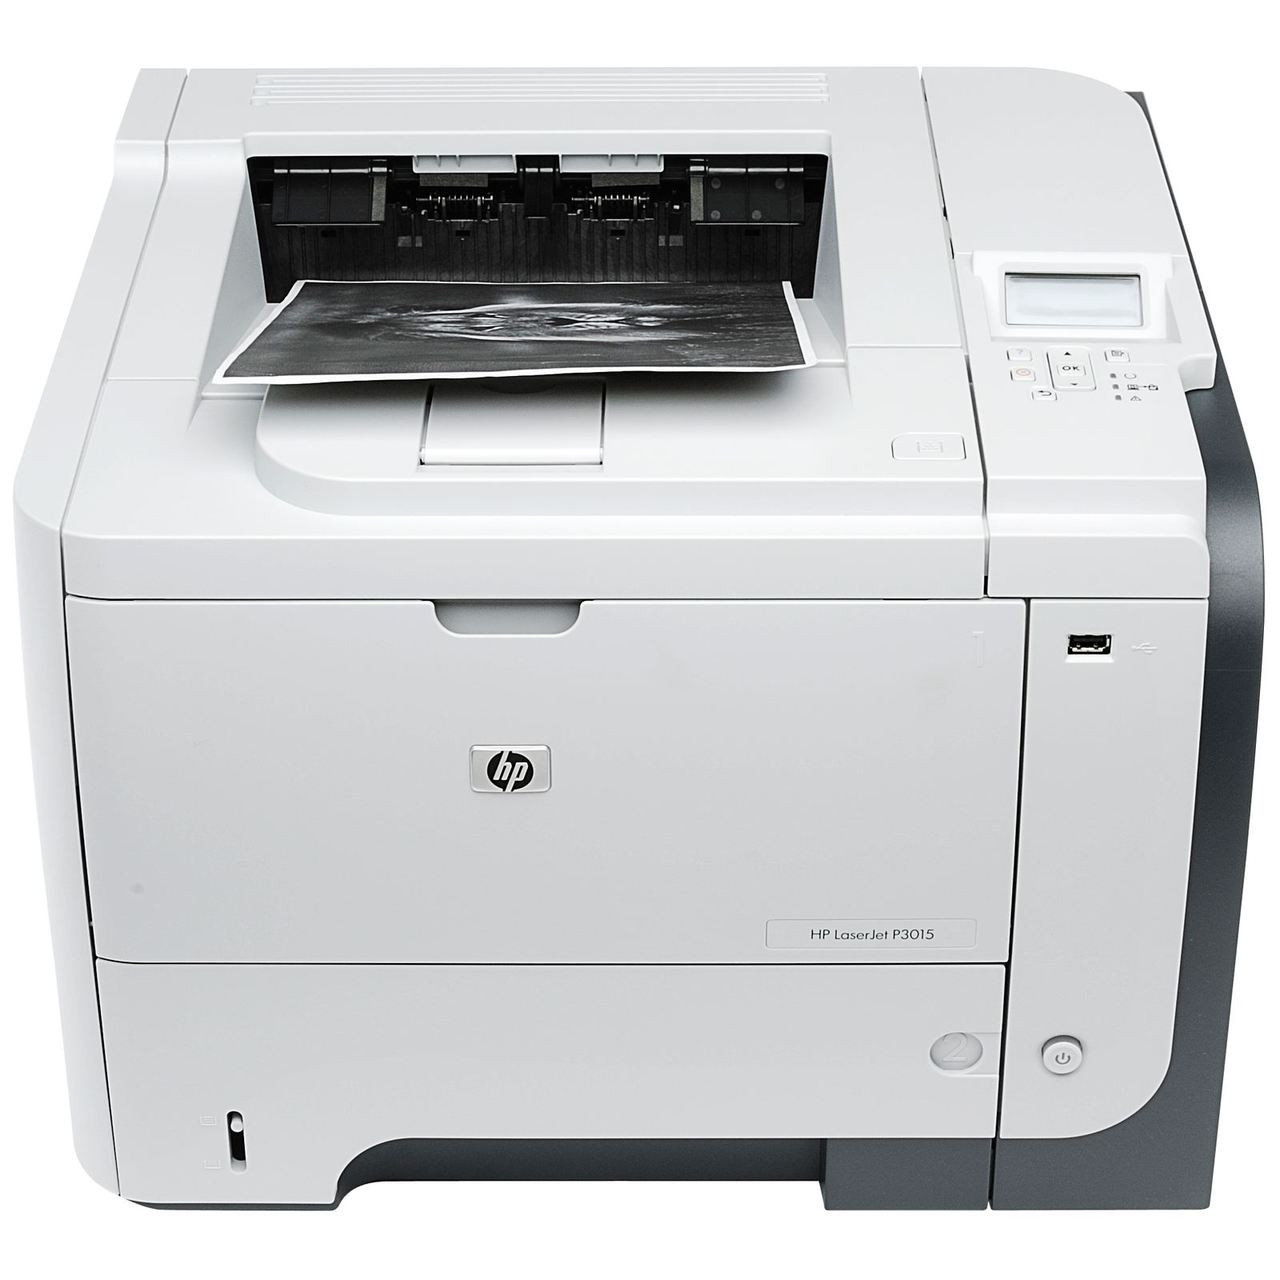 HP LaserJet P3015d - CE526A - HP Laser Printer for sale